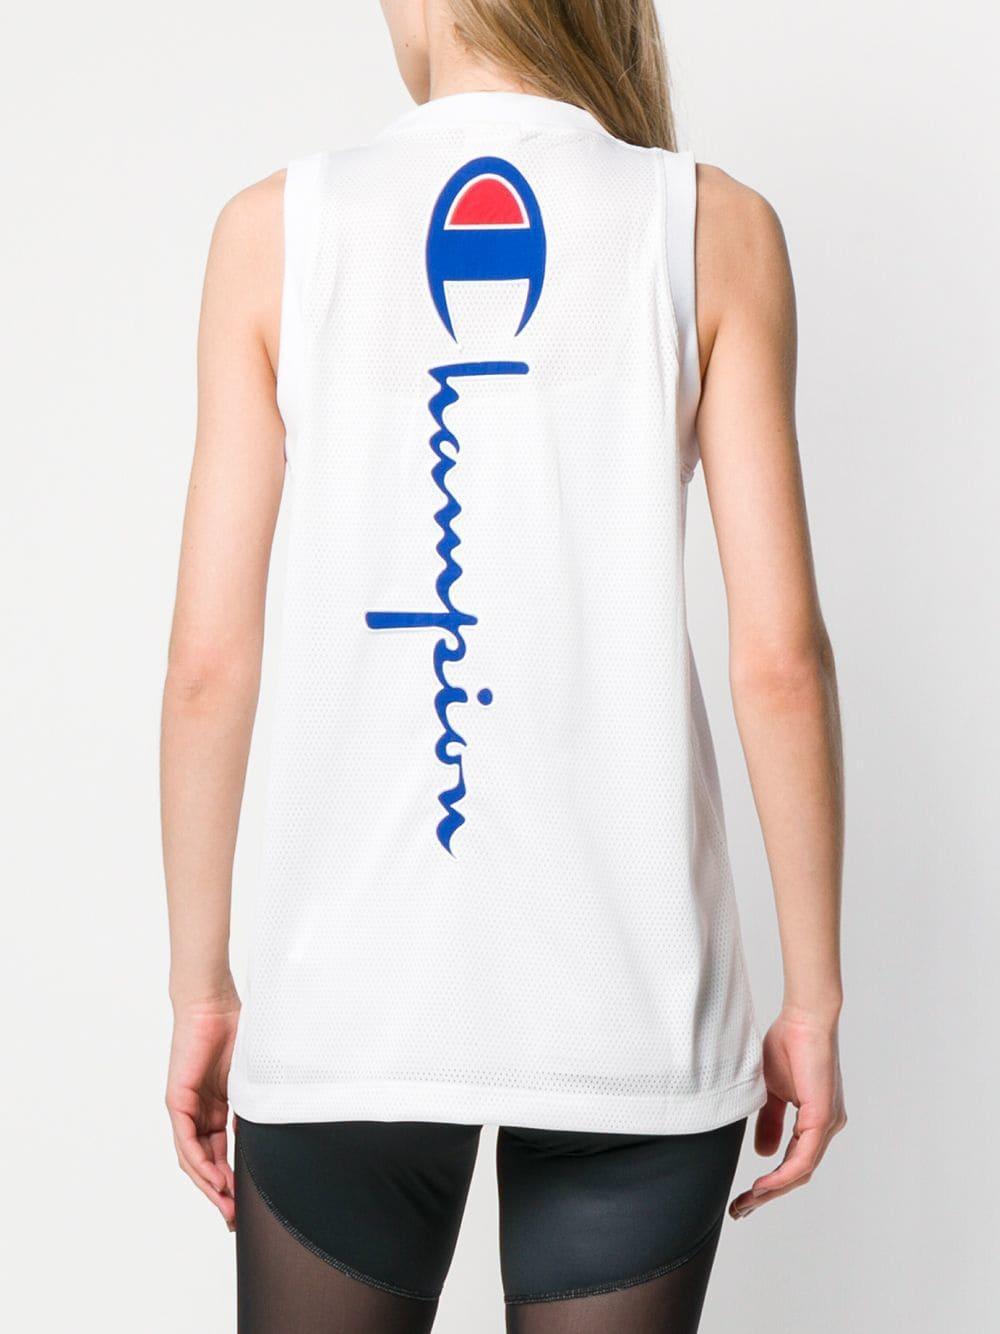 e3d9c22e46a2 Champion - White Embroidered Logo Vest Top - Lyst. View fullscreen